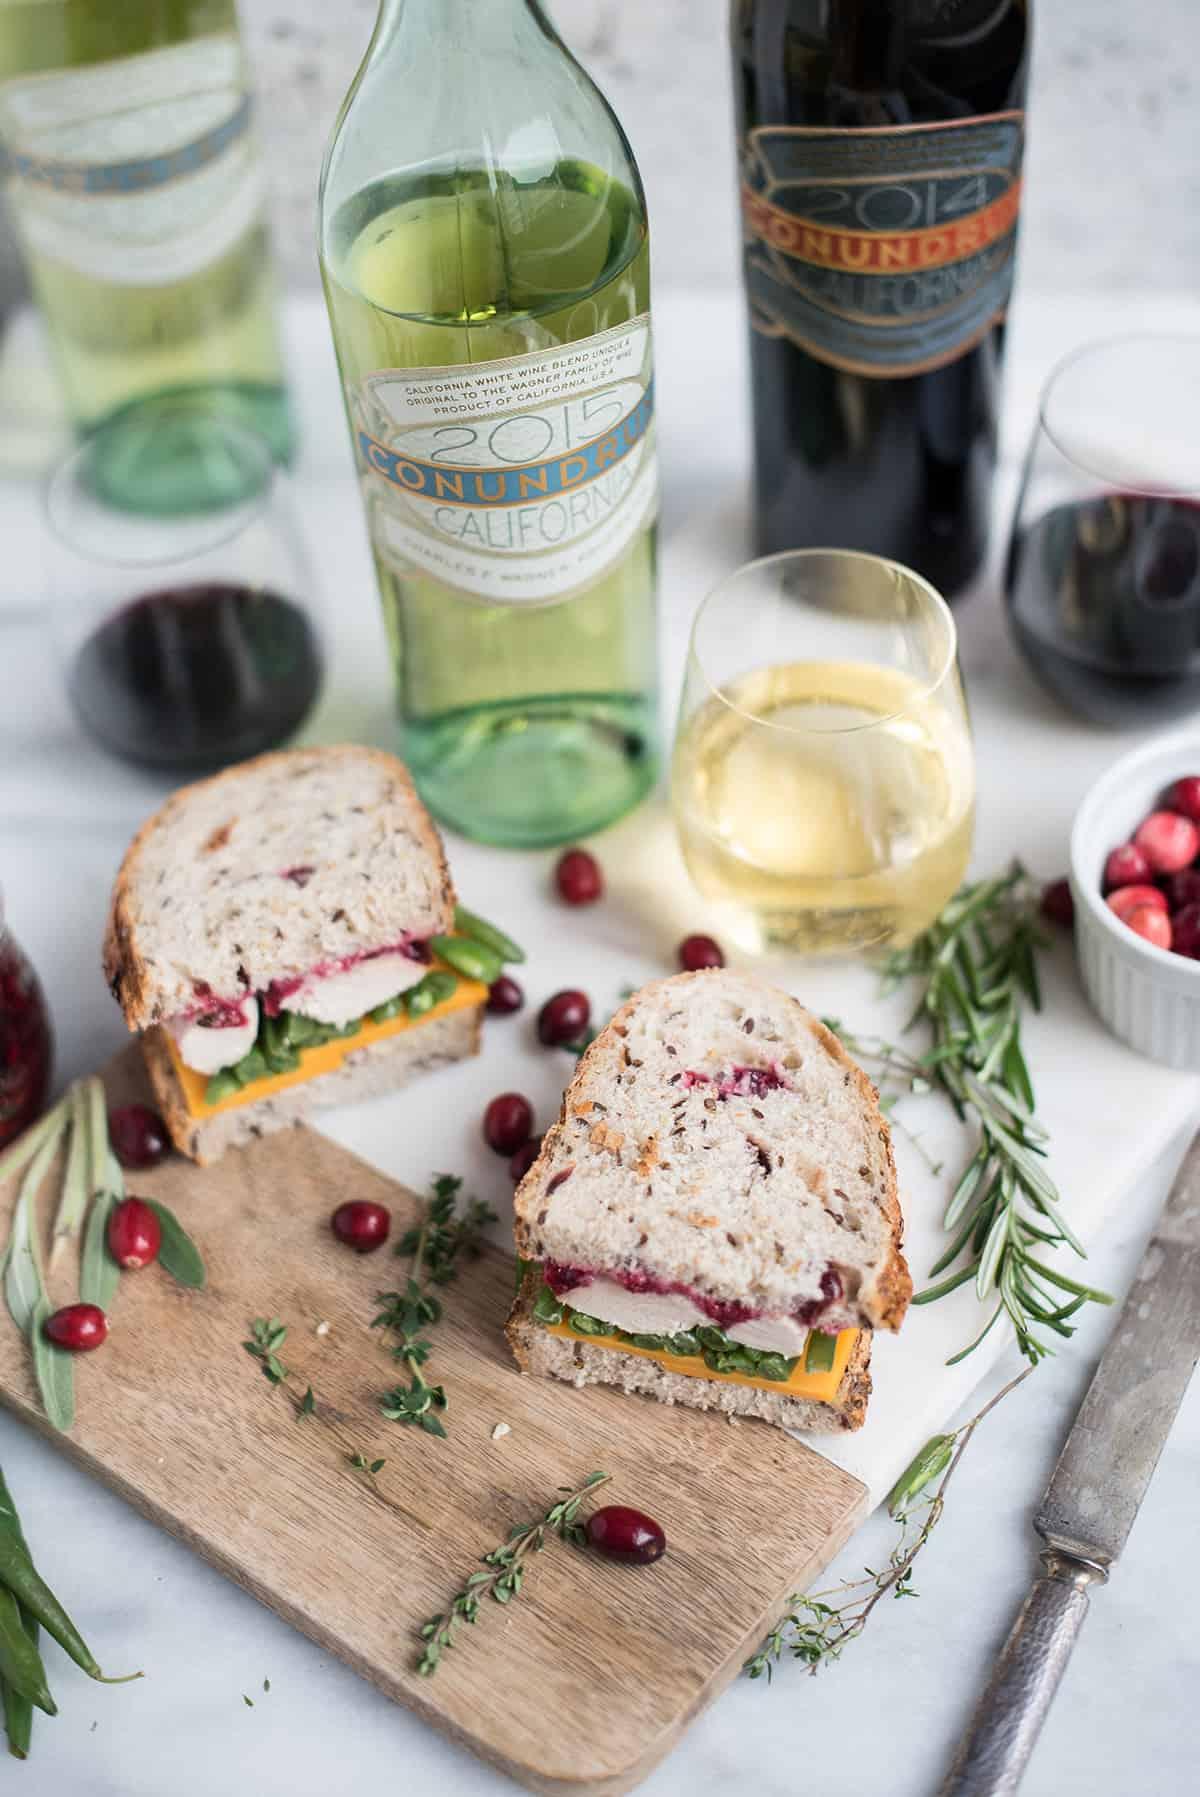 leftover turkey sandwich cut in half on board with white wine